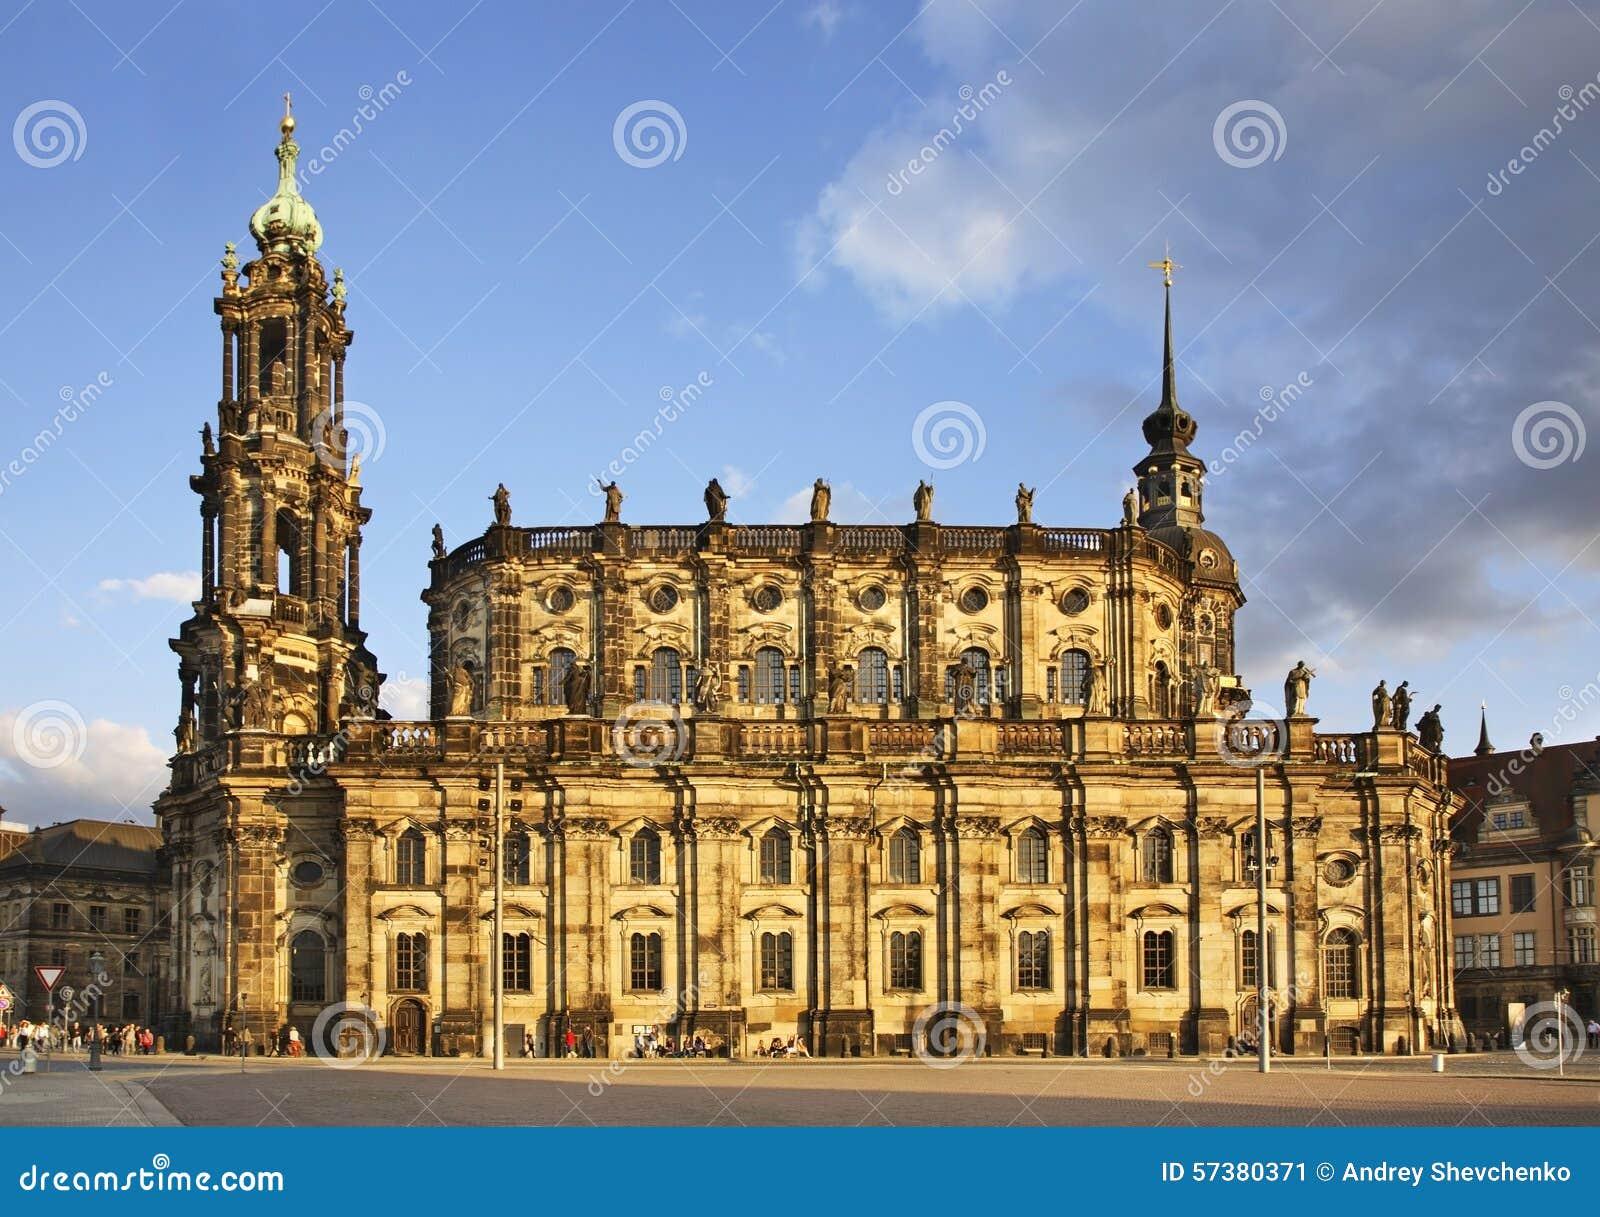 Katholische Hofkirche in Dresden duitsland